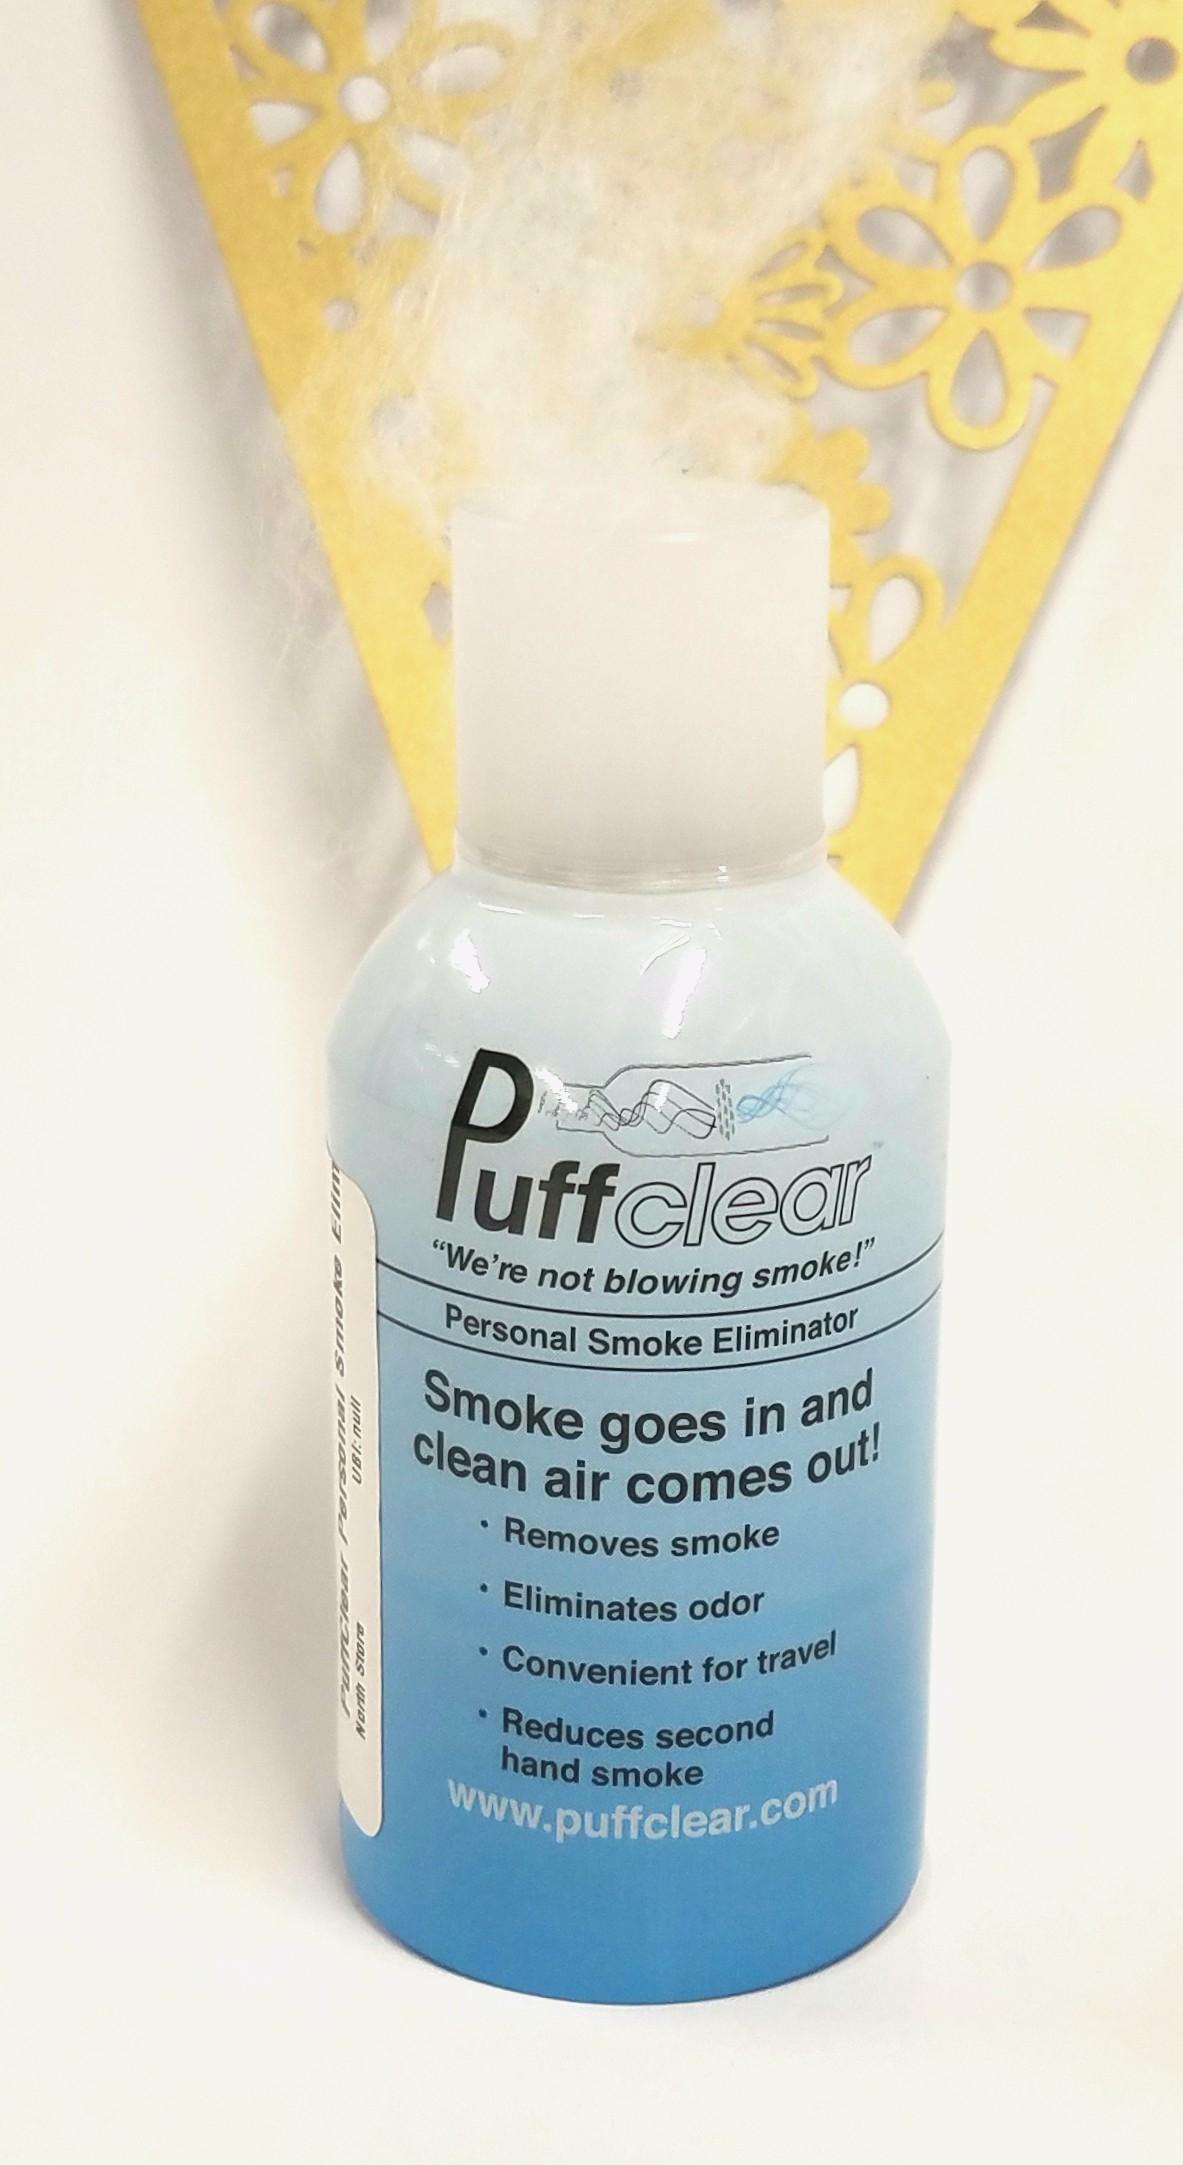 Puffclear Personal Smoke Eliminator